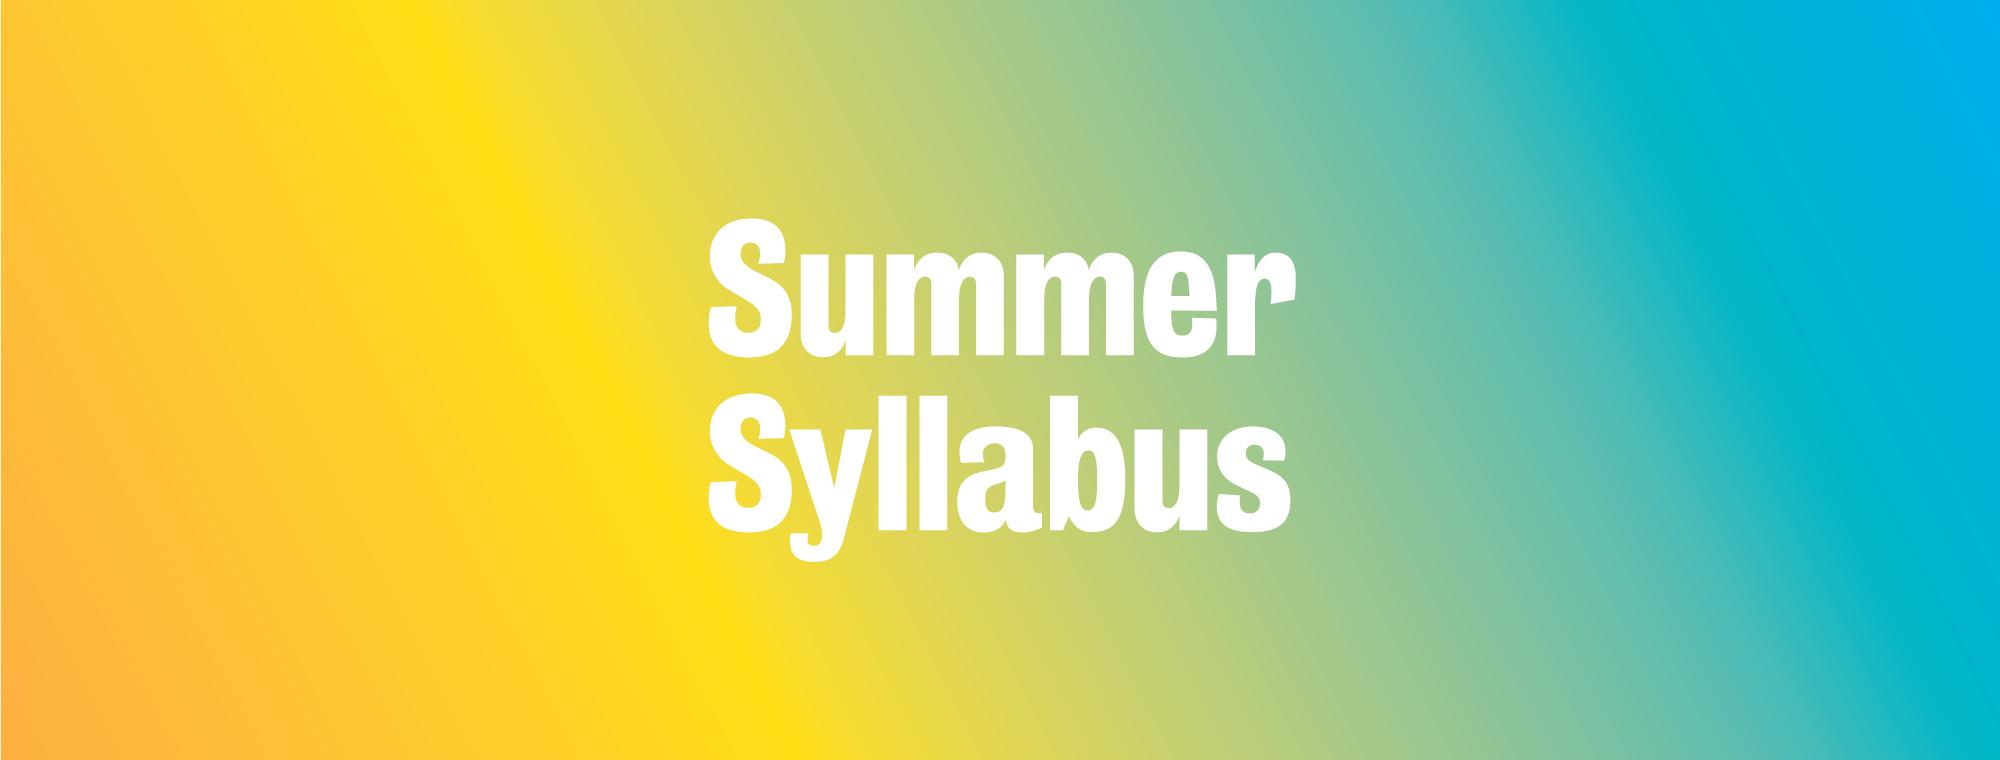 Summer Syllabus 2019